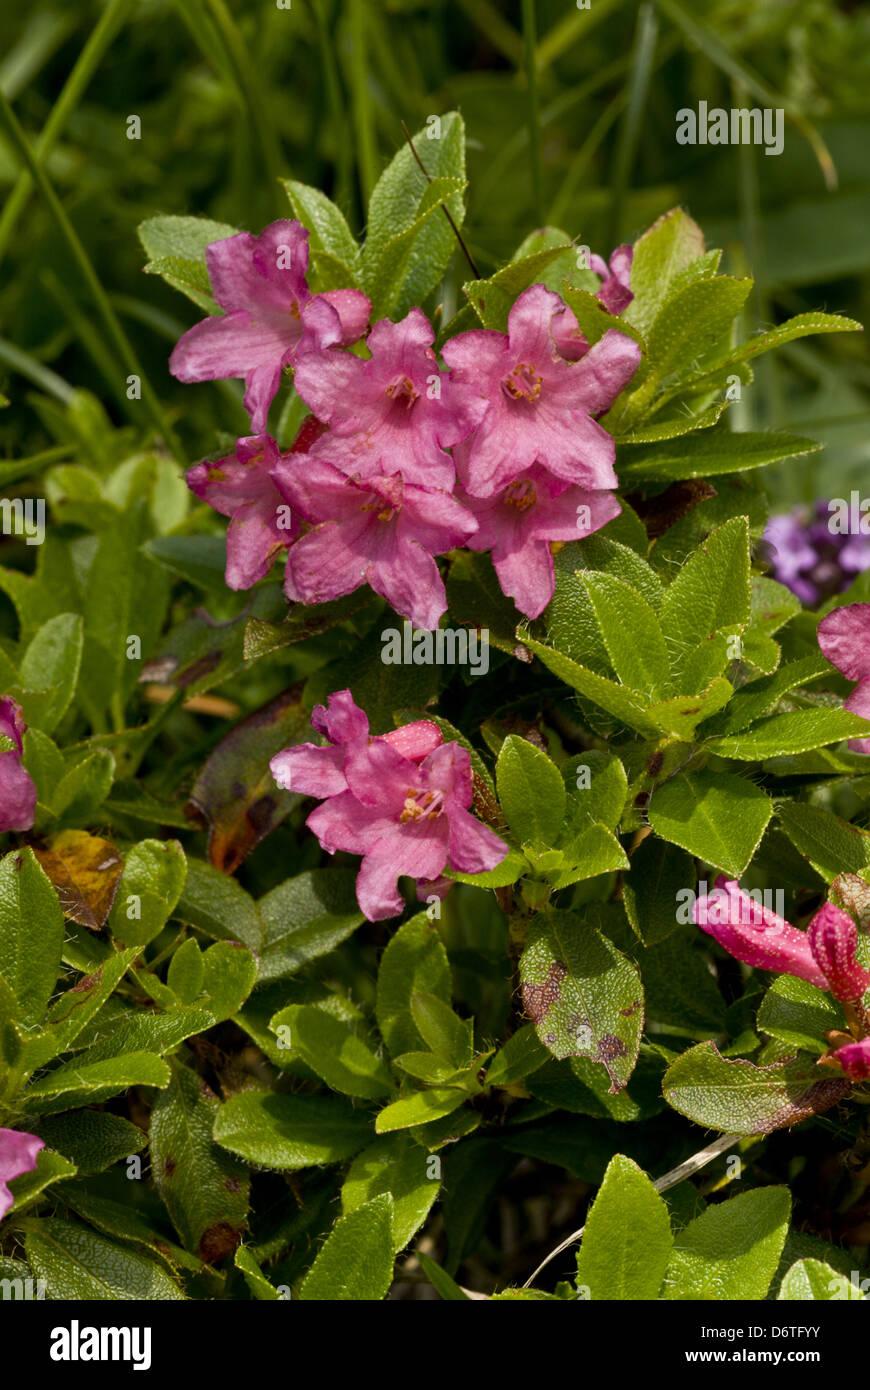 Hairy Alpenrose (Rhododendron hirsutum) flowering, growing on limestone, German Alps, Bavaria, Germany, July - Stock Image